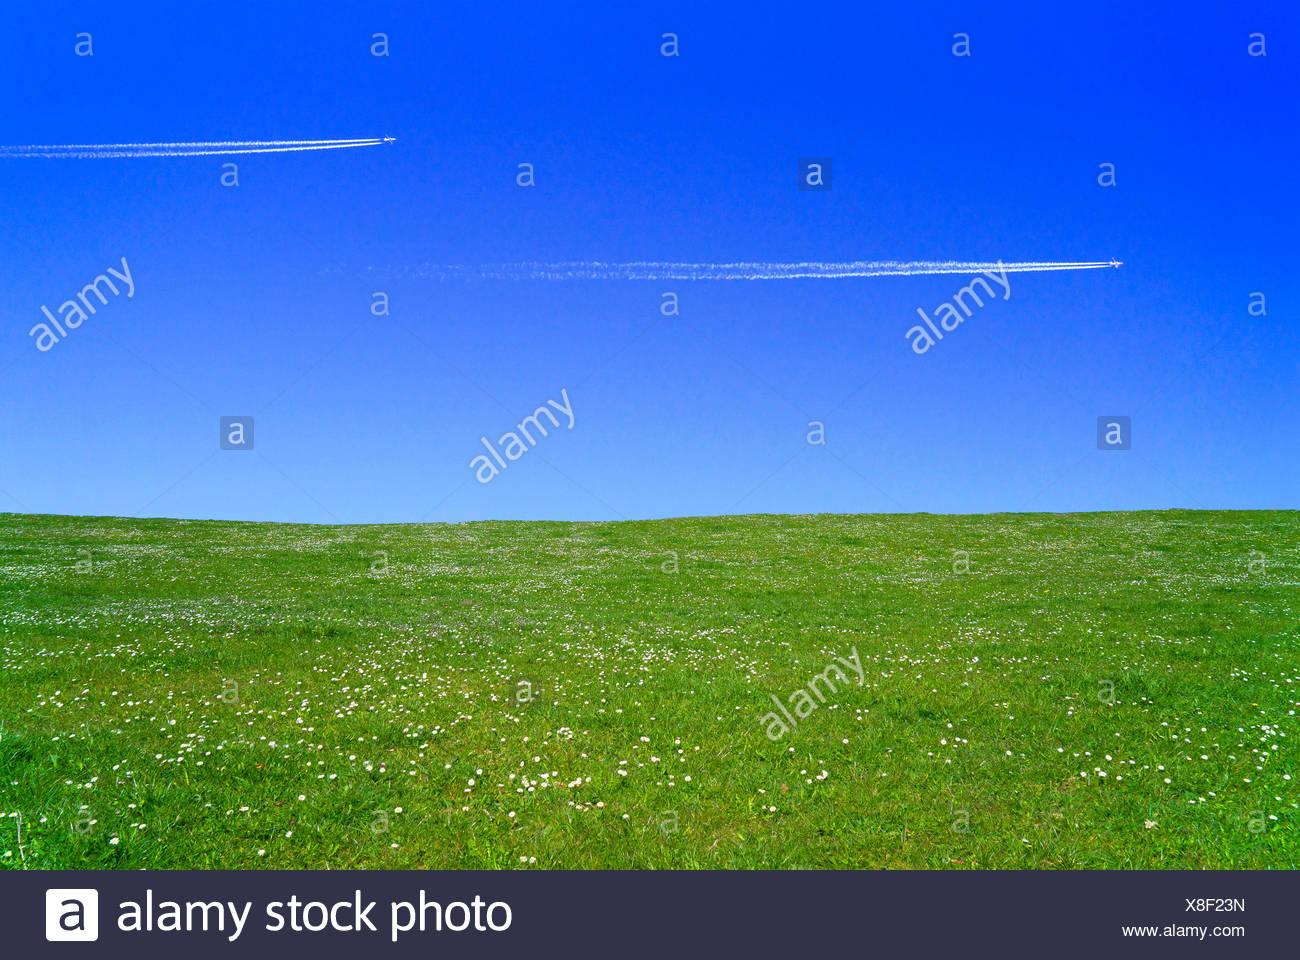 green meadow and blue sky, Germany, Bavaria, Oberbayern, Upper Bavaria - Stock Image